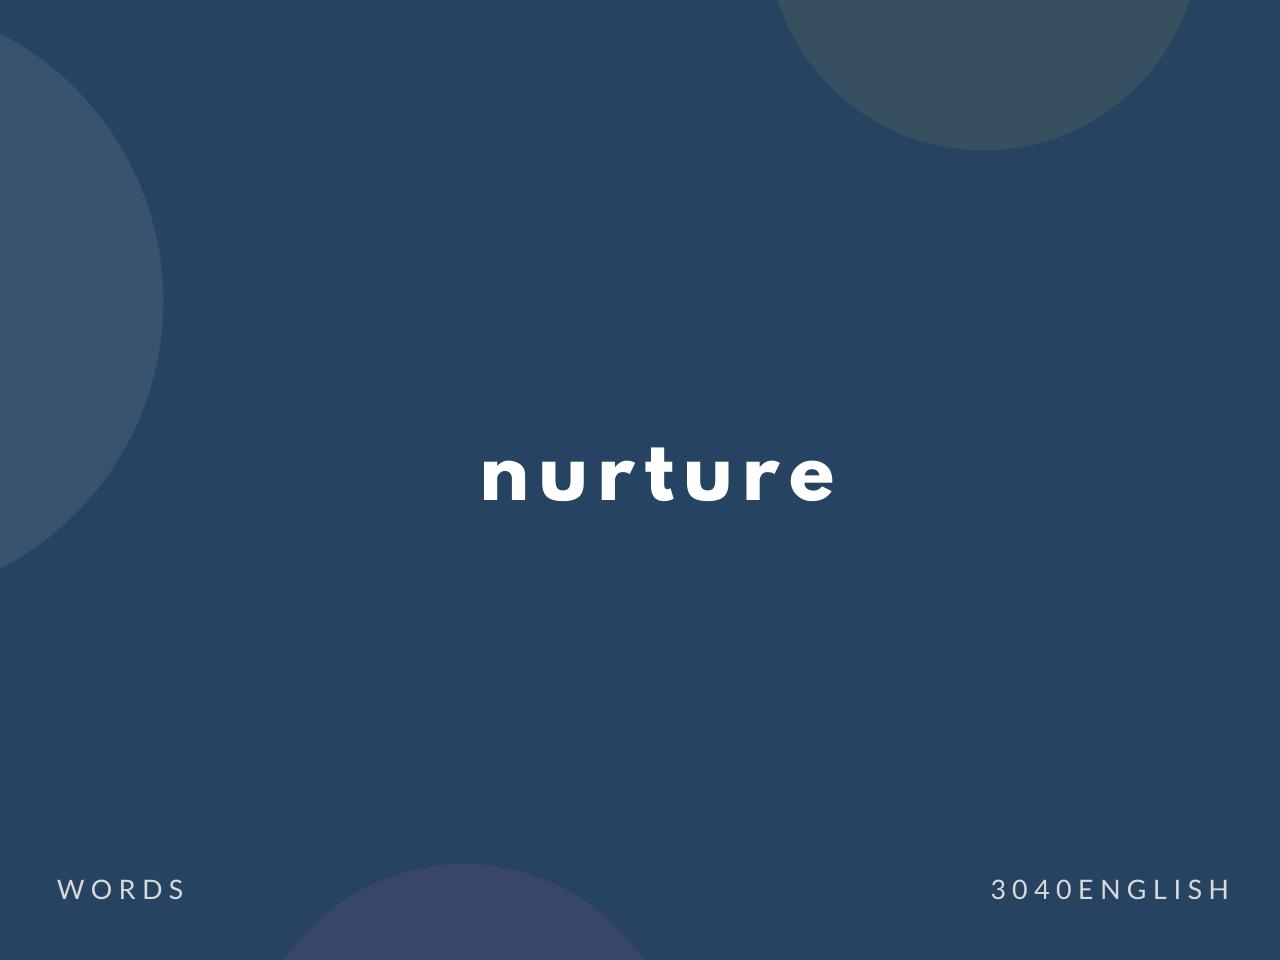 nurture の意味と簡単な使い方【音読用例文あり】